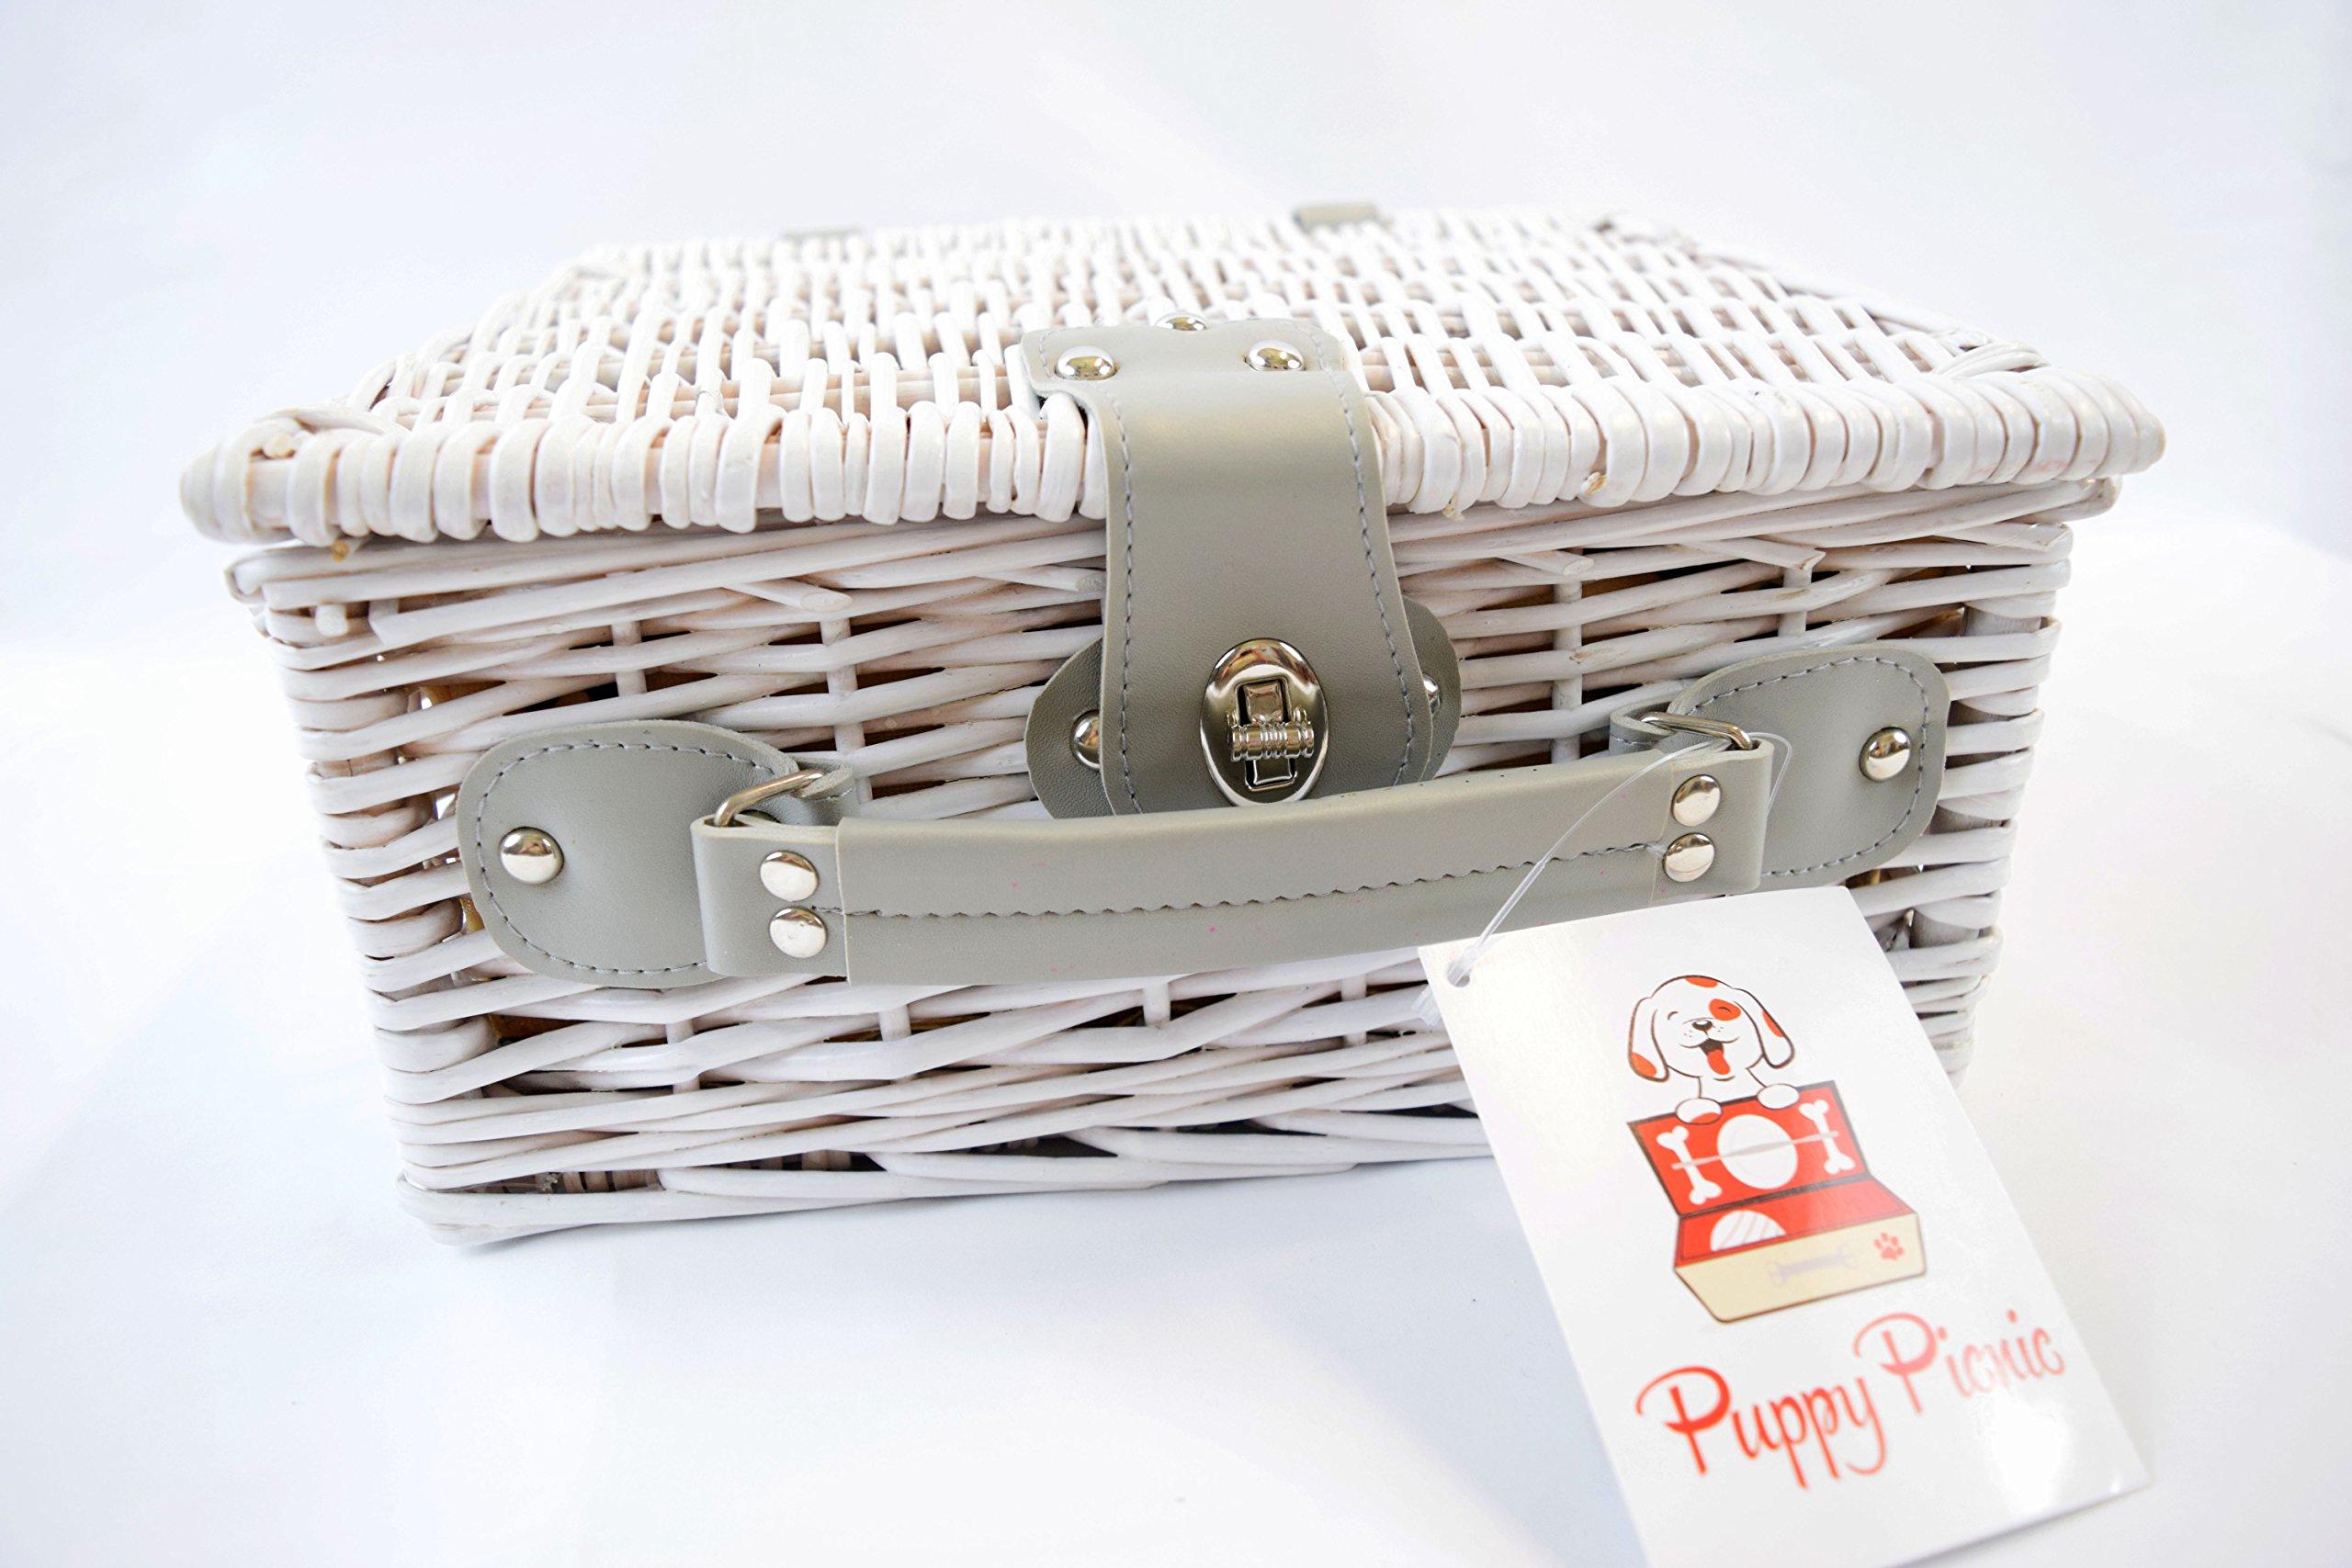 Dog Gift Basket with Dog Bowls, Dog Toy, Dog Brush - Puppy Picnic White Wicker Basket